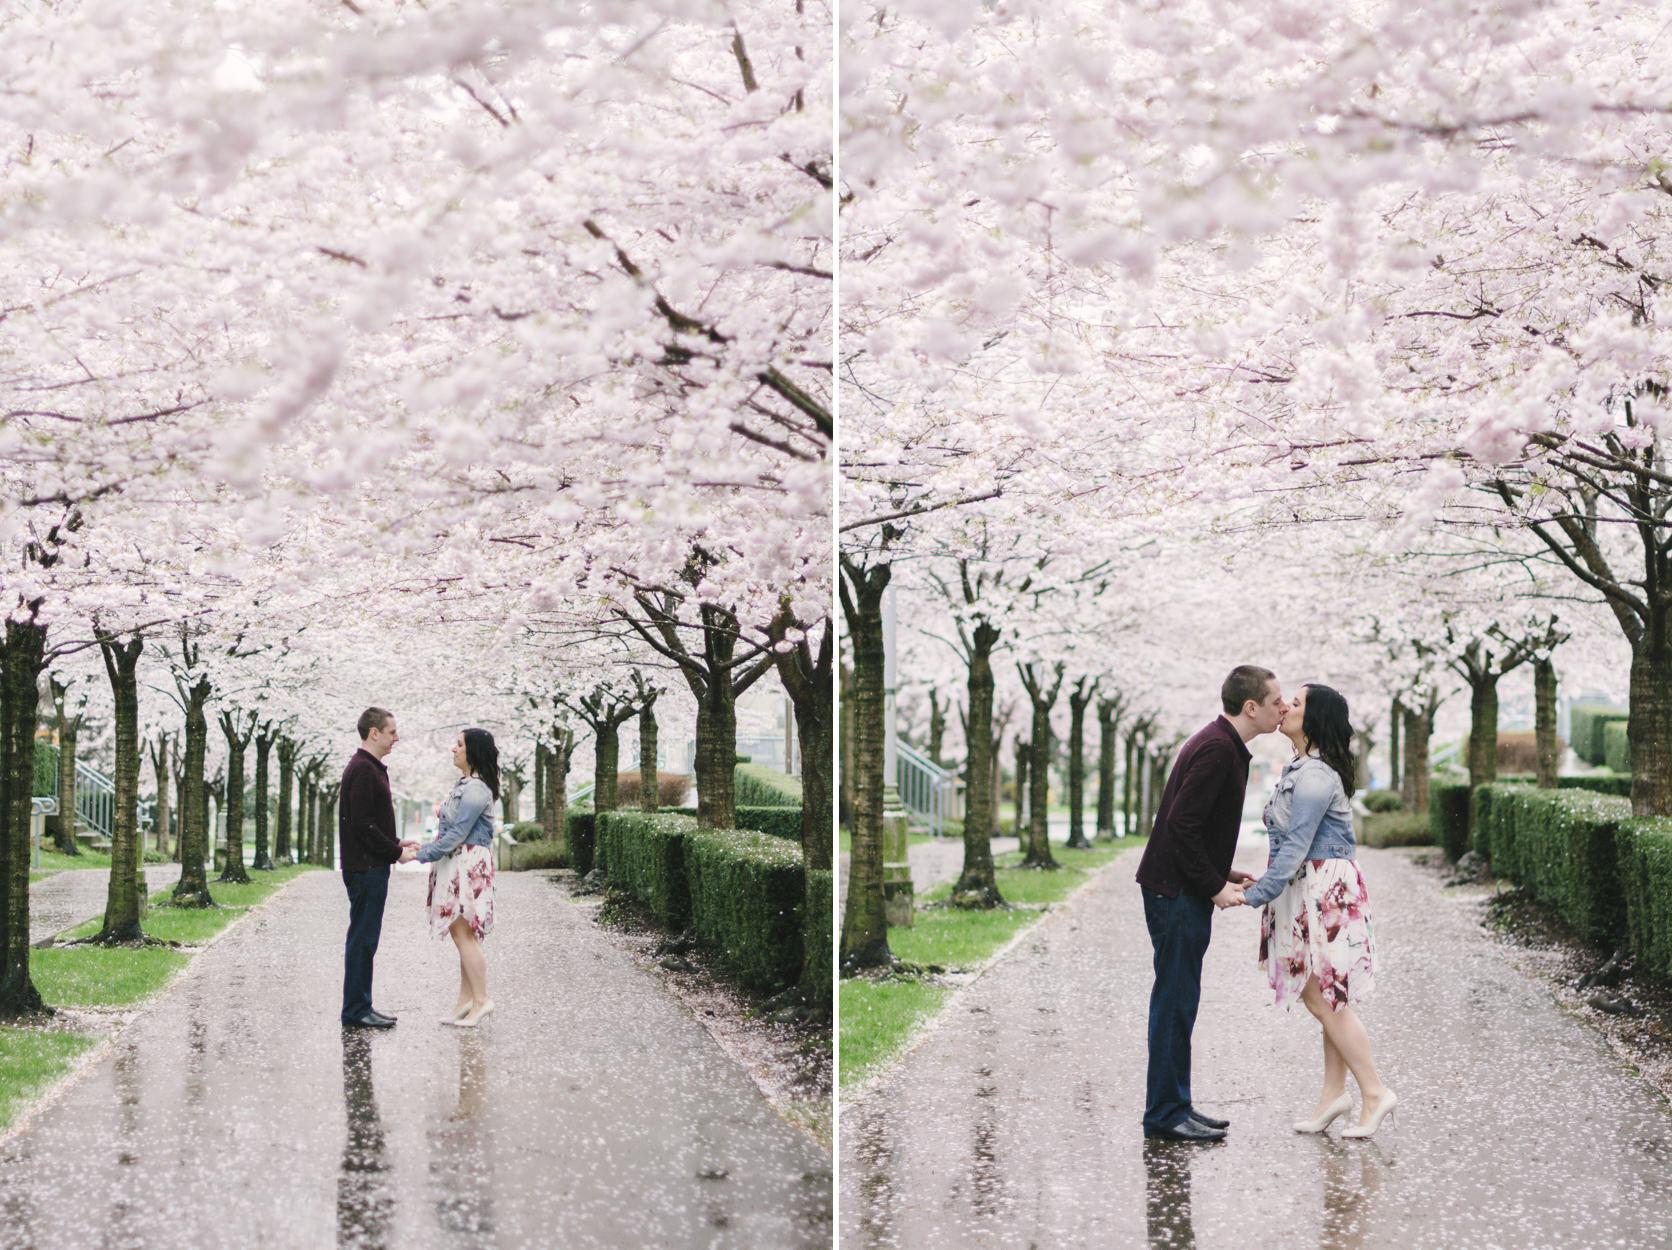 cherry-blossom-engagement-15.jpg